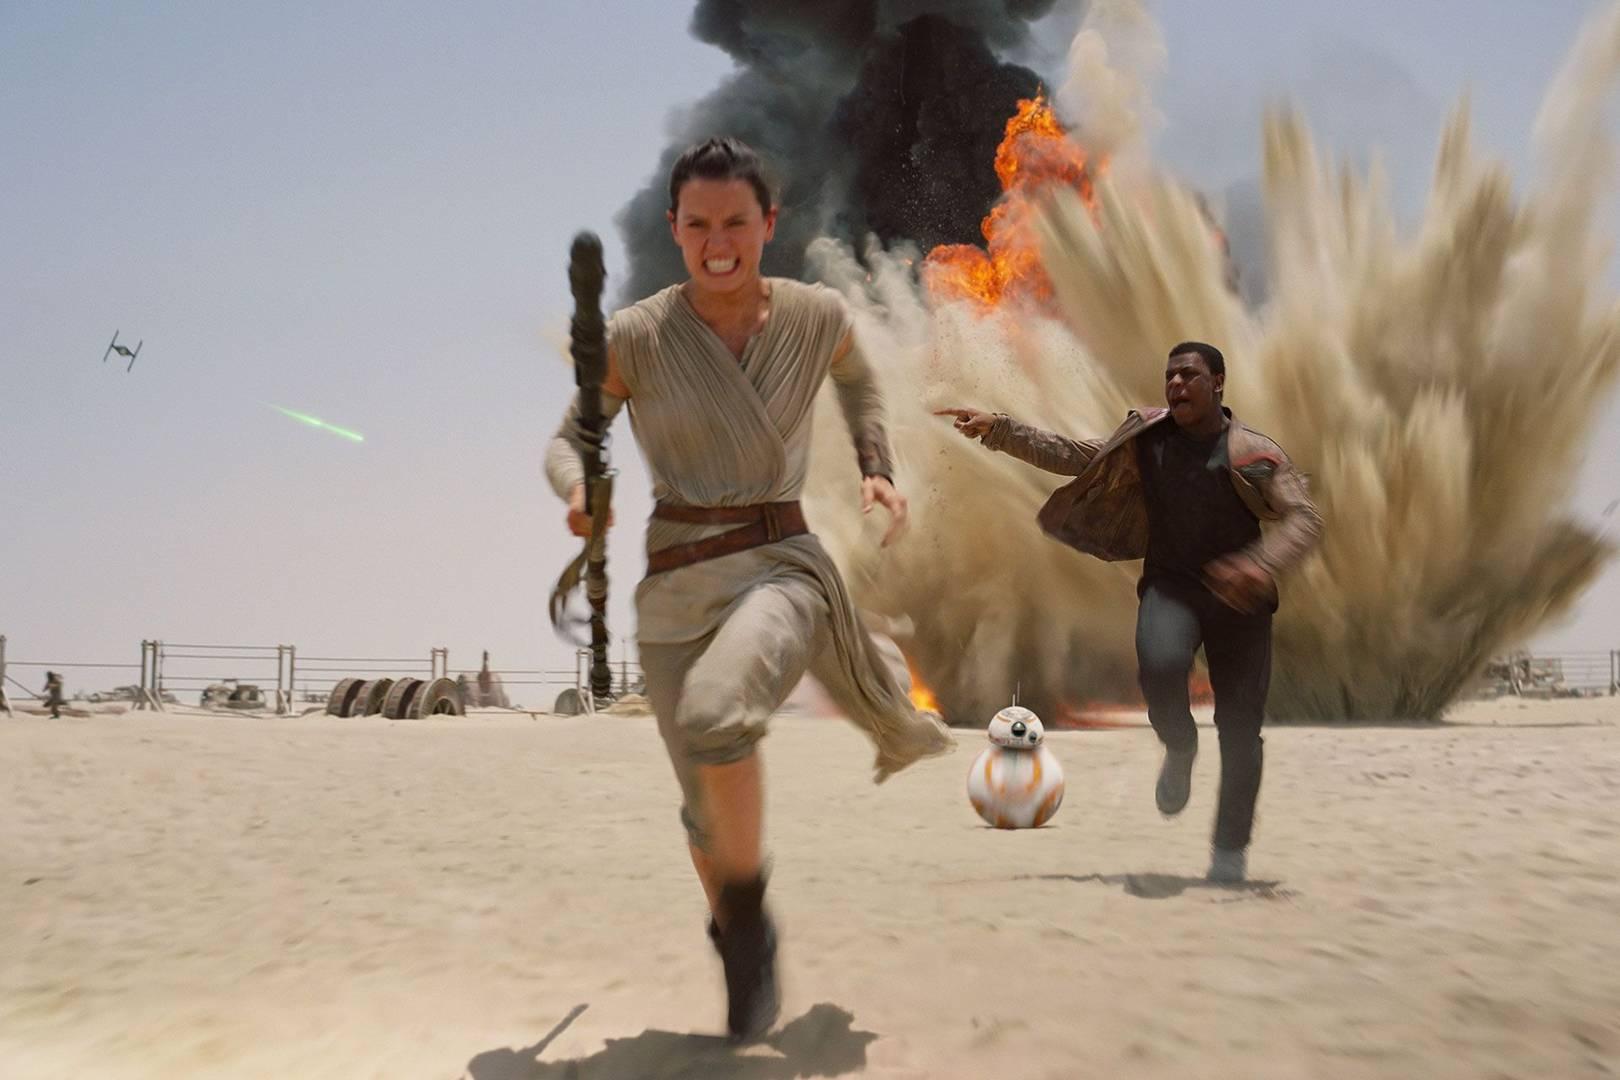 Daisy Ridley John Boyega The Force Awakens